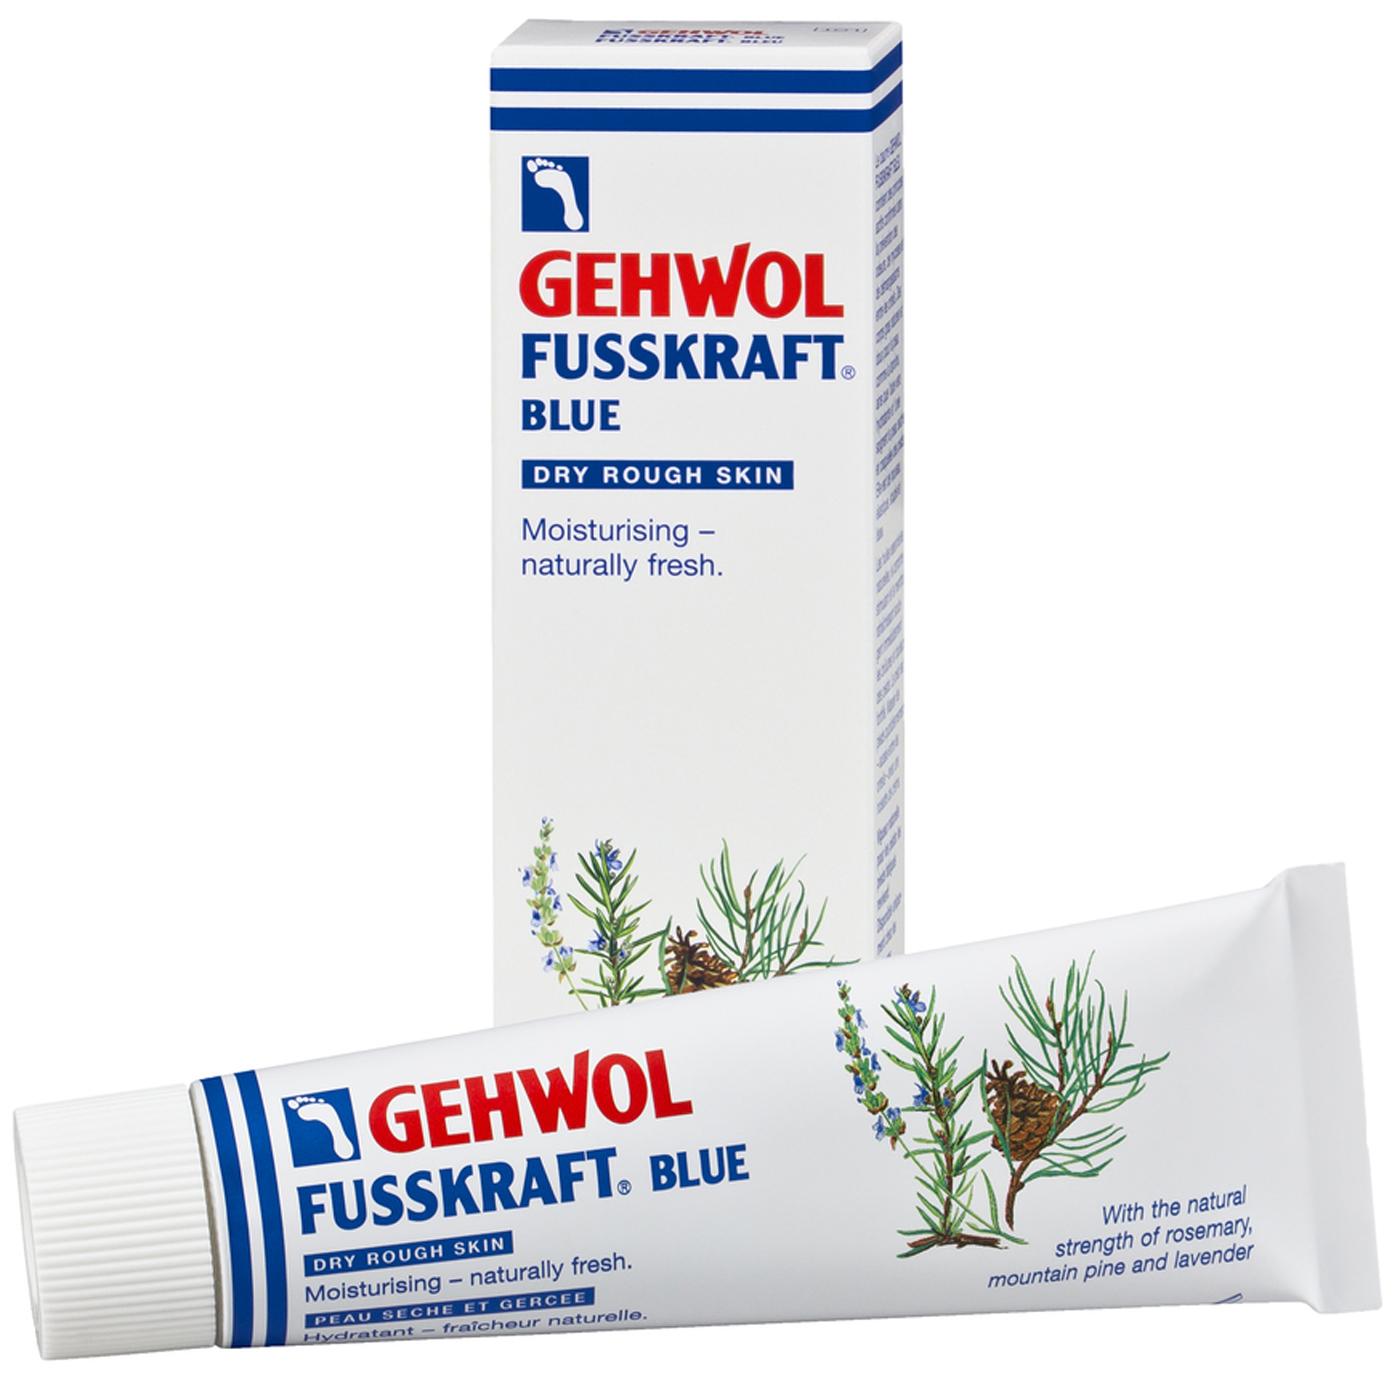 Gehwol Fusskraft Blue Κρέμα για την Καθημερινή Φροντίδα του Σκληρού, Ξηρού & Άγριου Δέρματος των Ποδιών 125ml